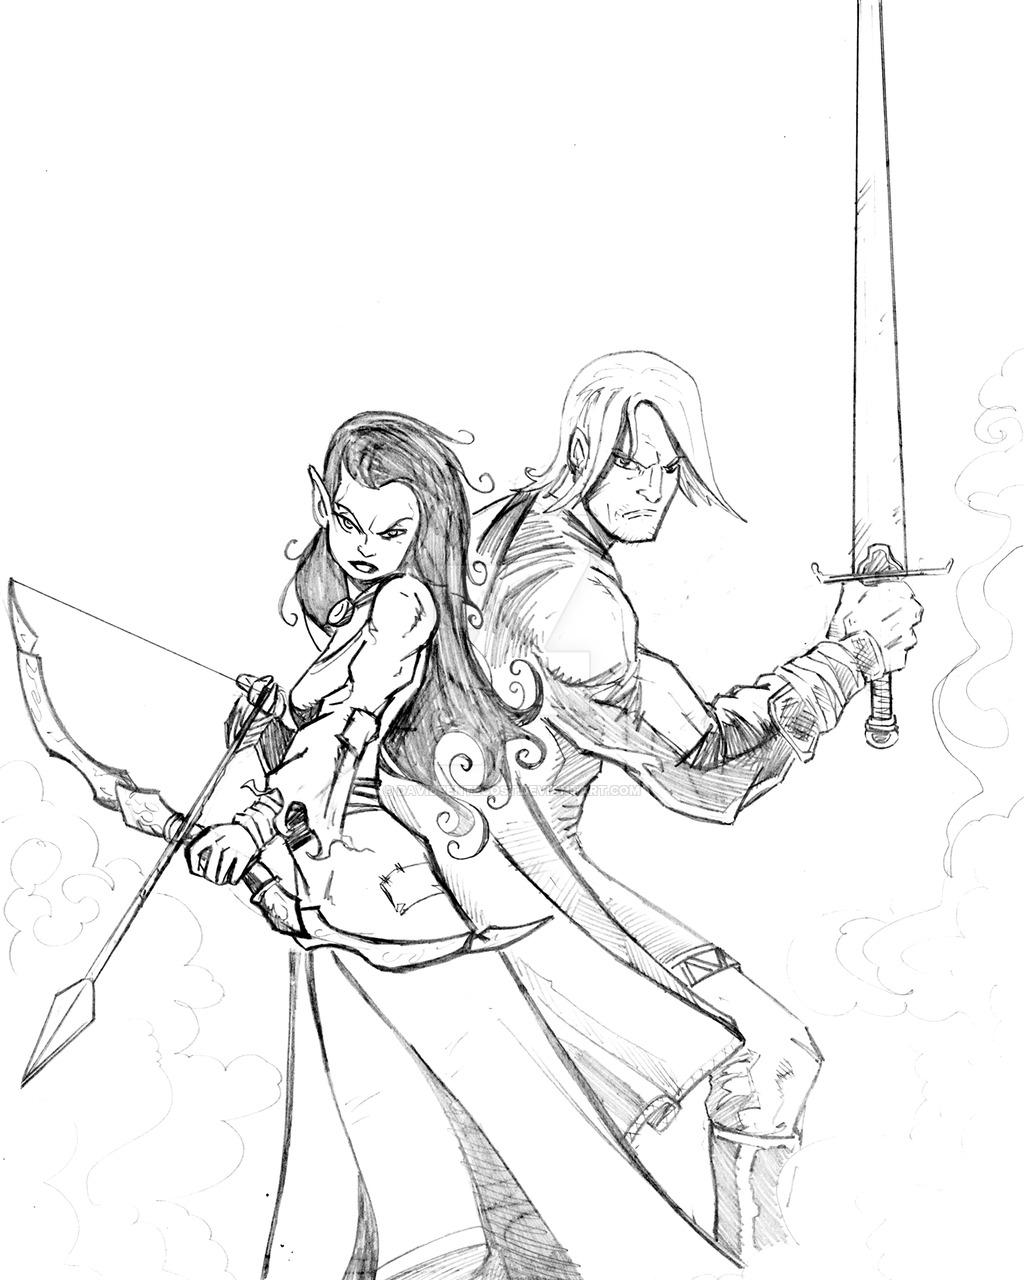 1024x1280 Elf Girl And Warrior Sketch By Davidpentecost